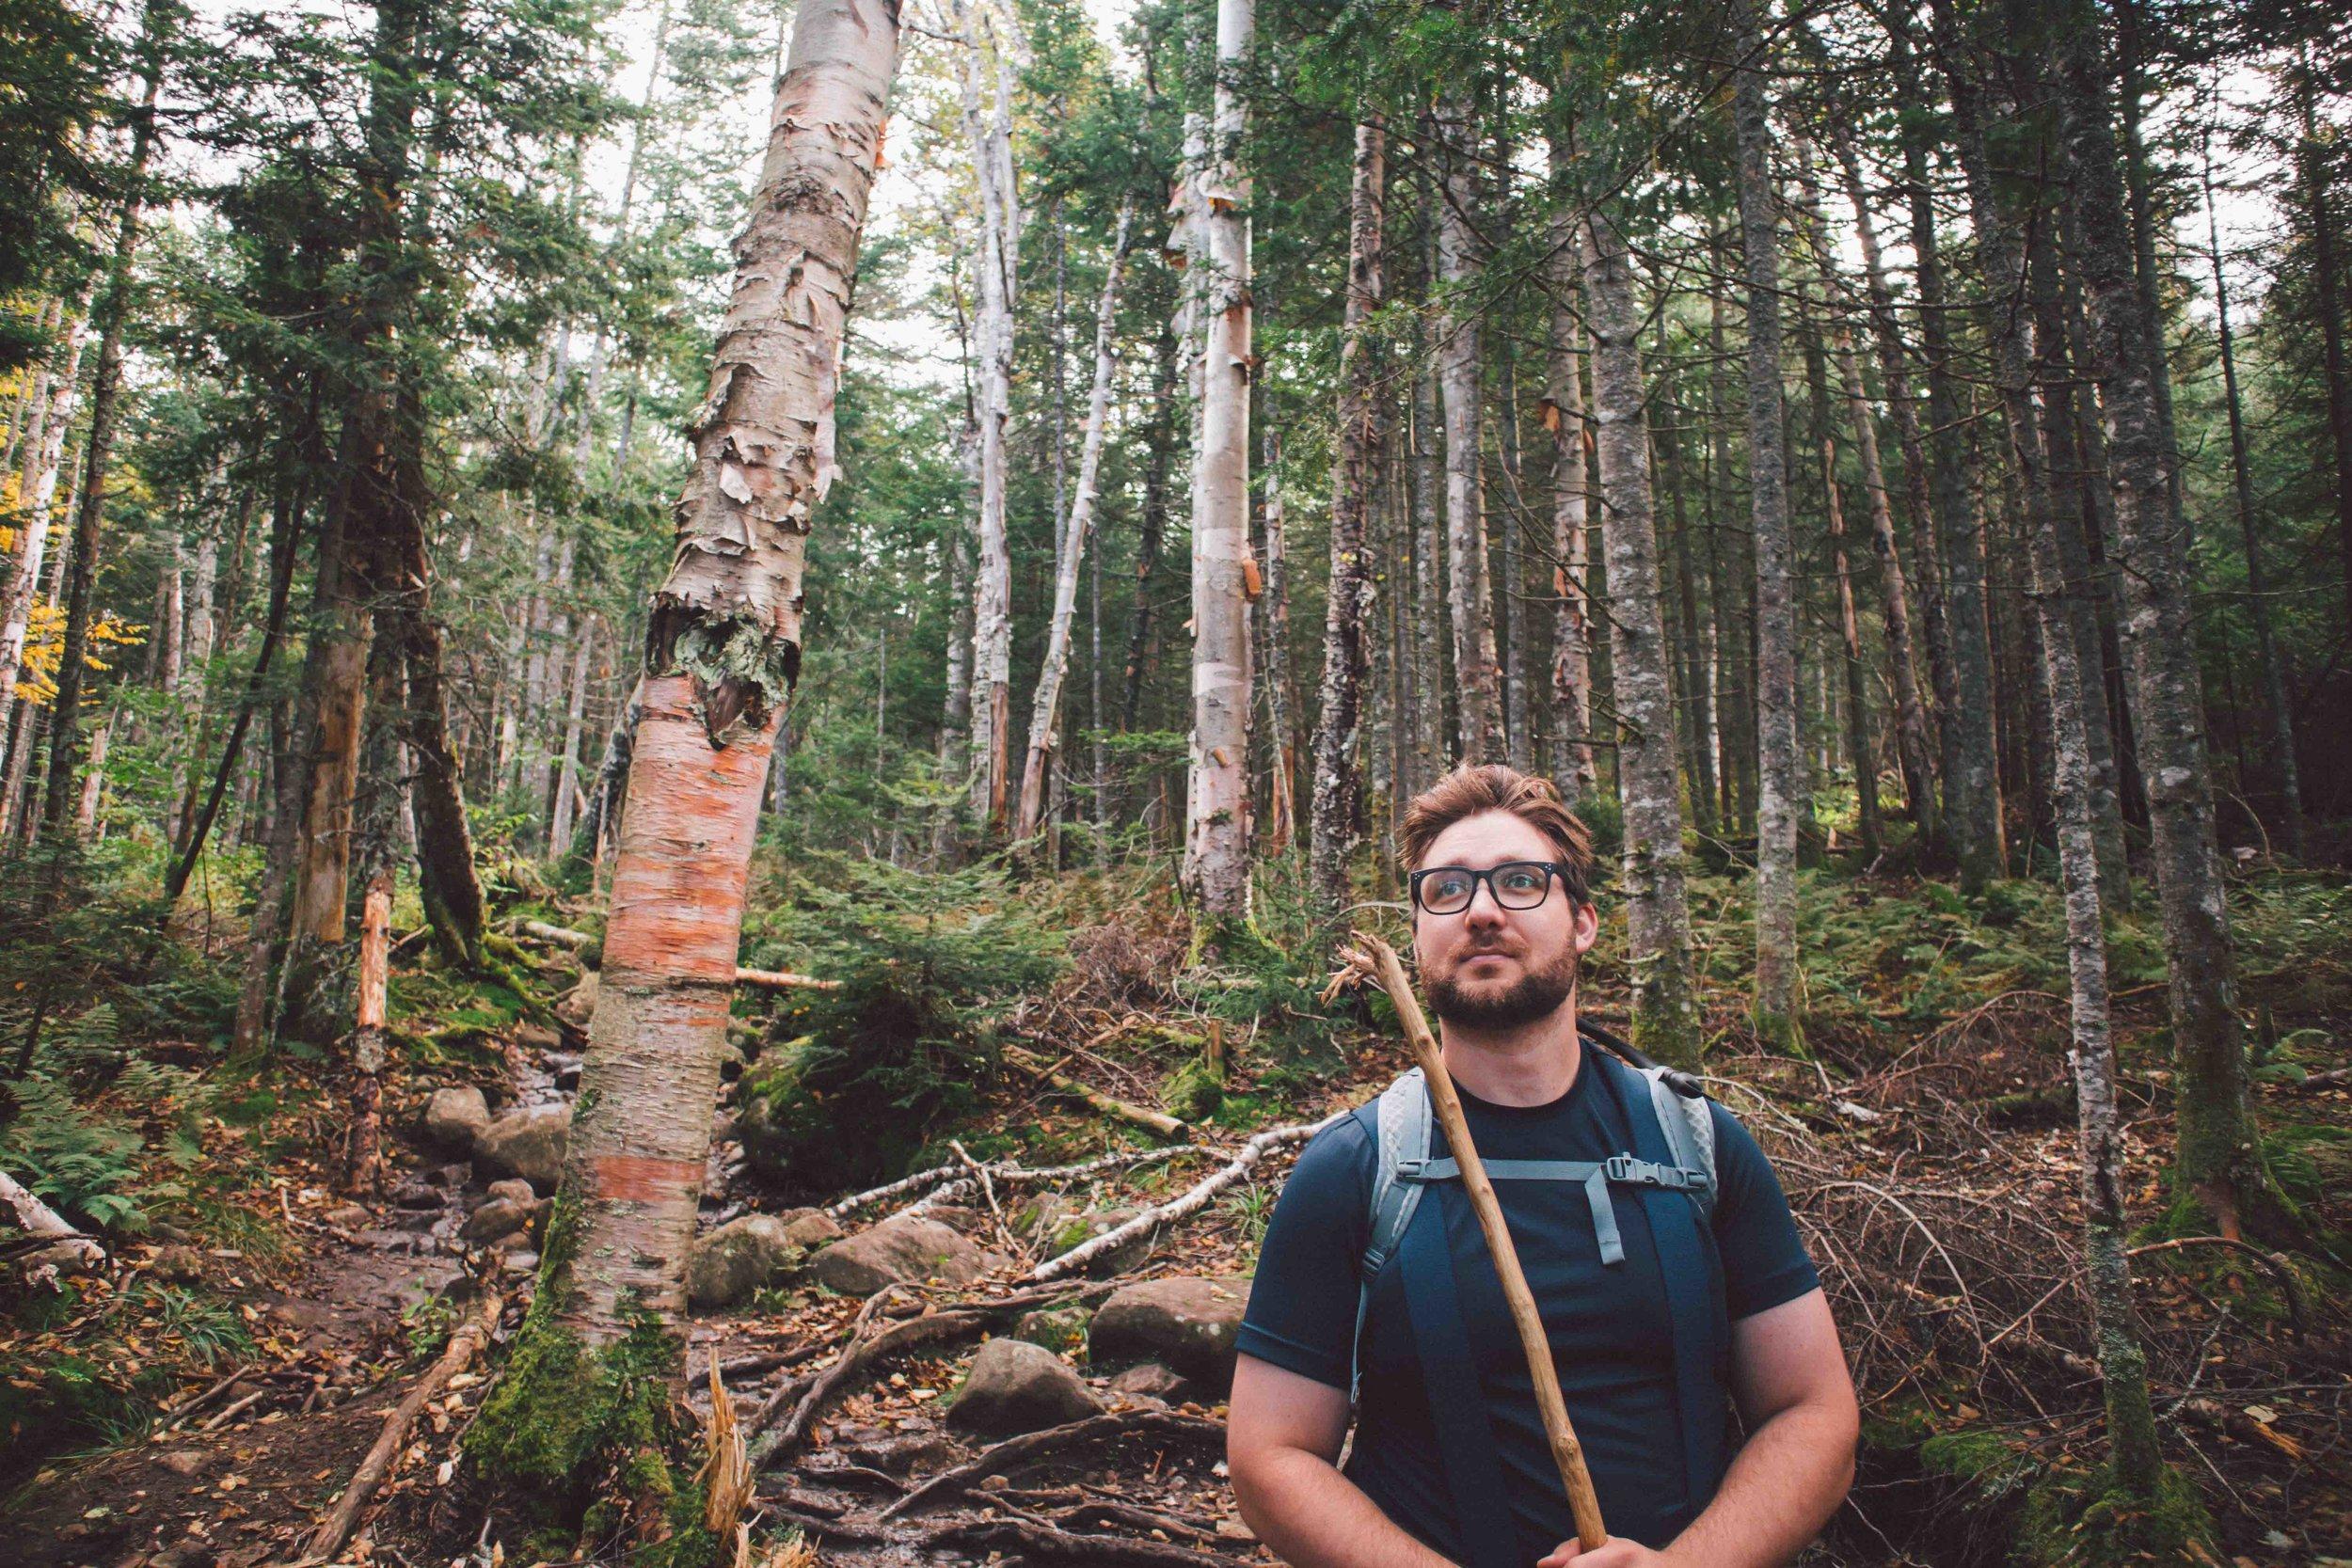 Adirondacks-2018-web-168-Mount-Marcy.jpg